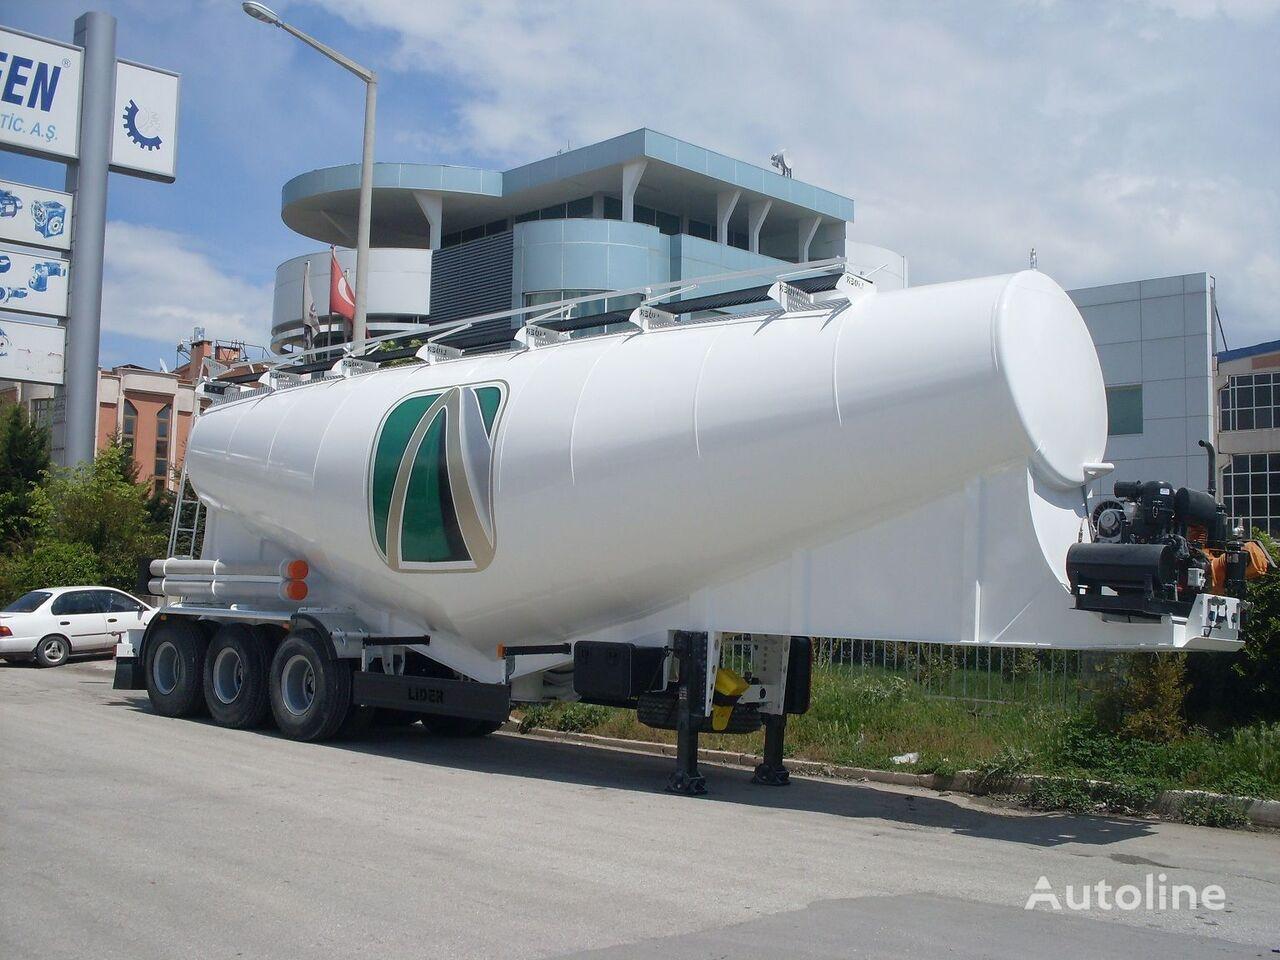 LIDER بلكر اسمنت مواصفات اوربية 2017 cisterna de cemento nueva